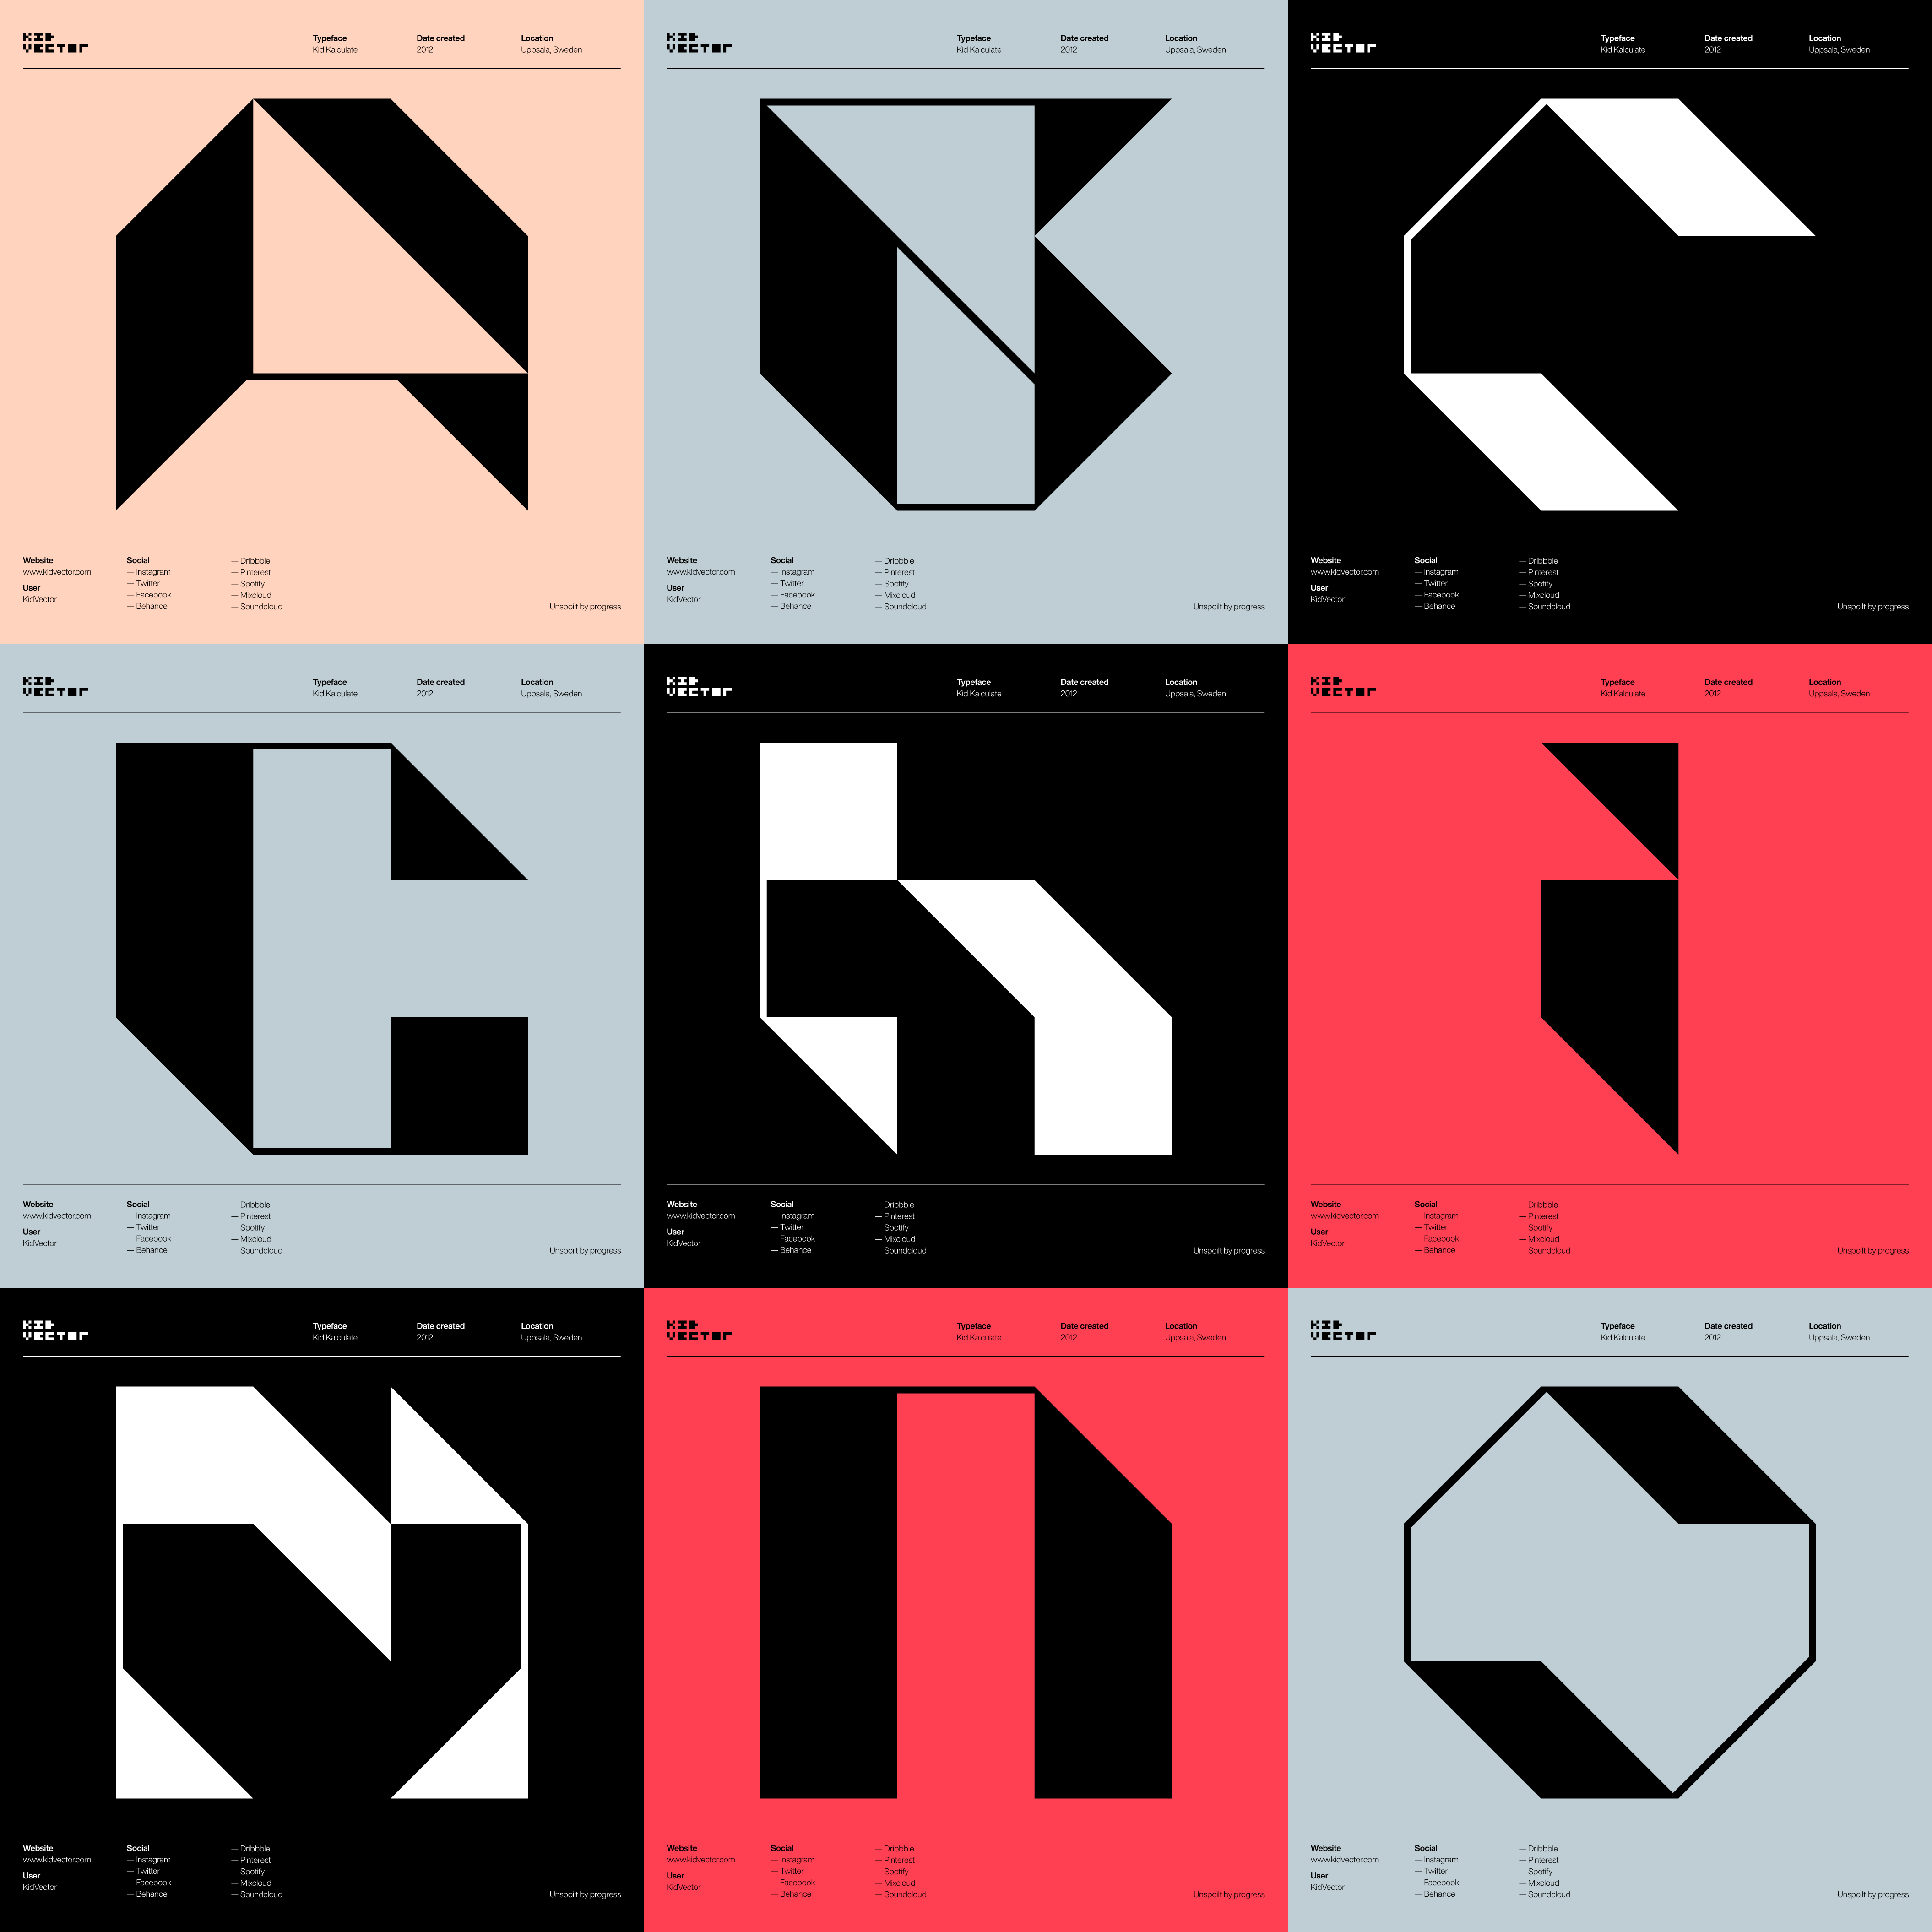 Kid Kalculate — 3 x 3 character grid 1